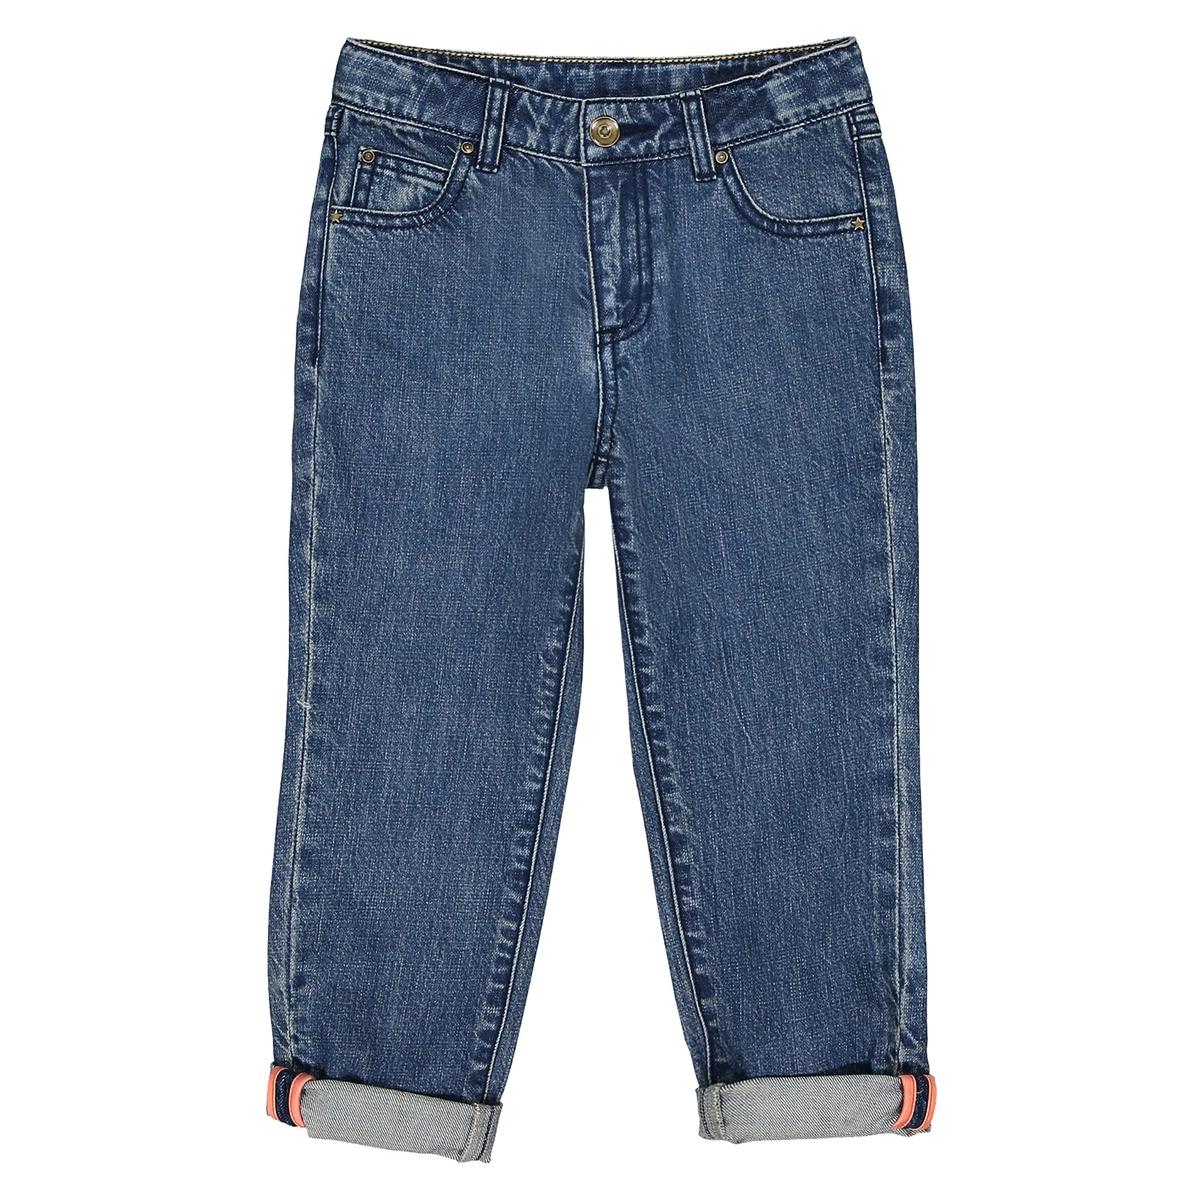 Jeans Boyfit 3 - 12 anni